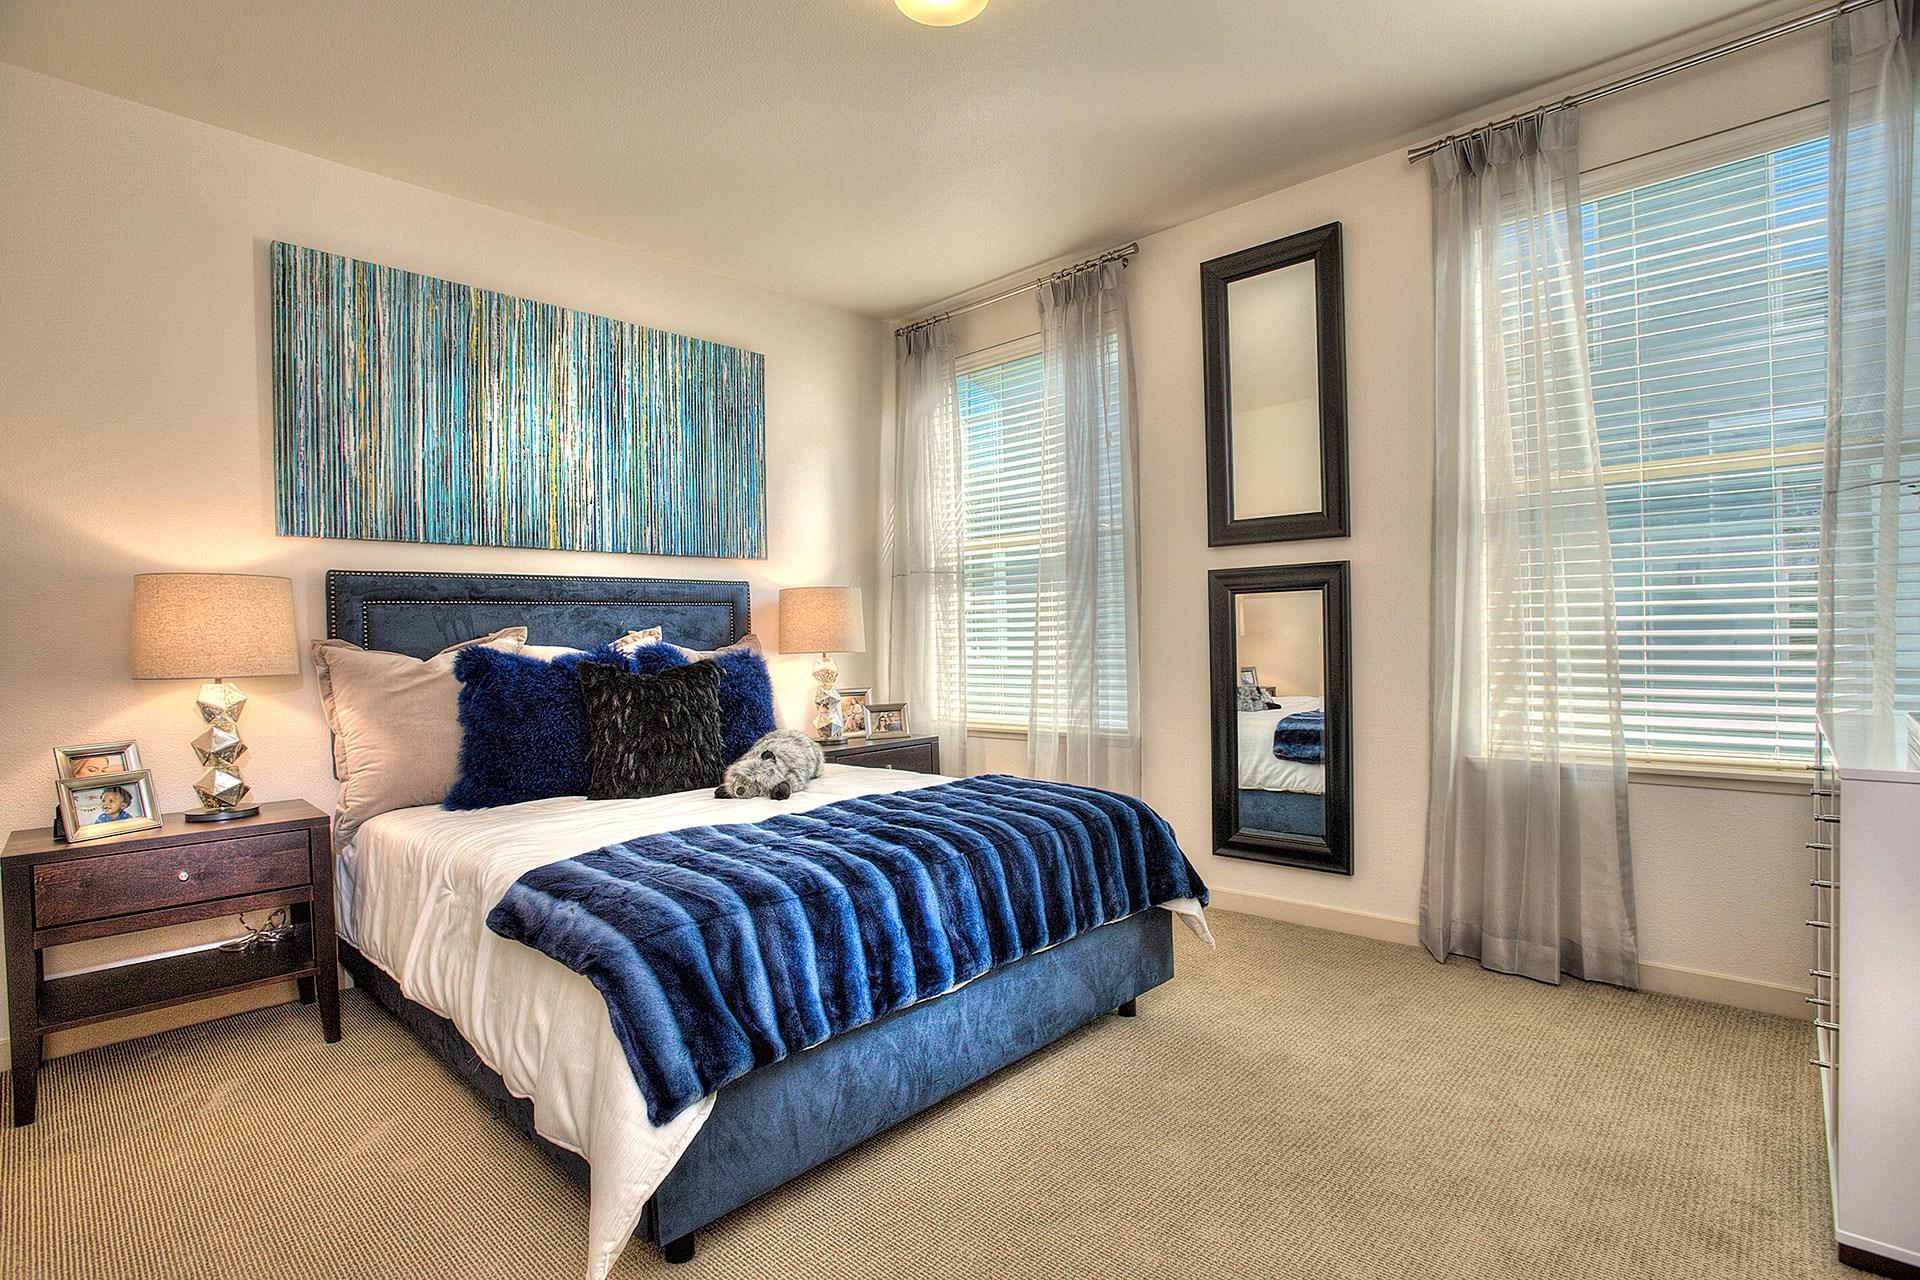 Light-Filled Rooms